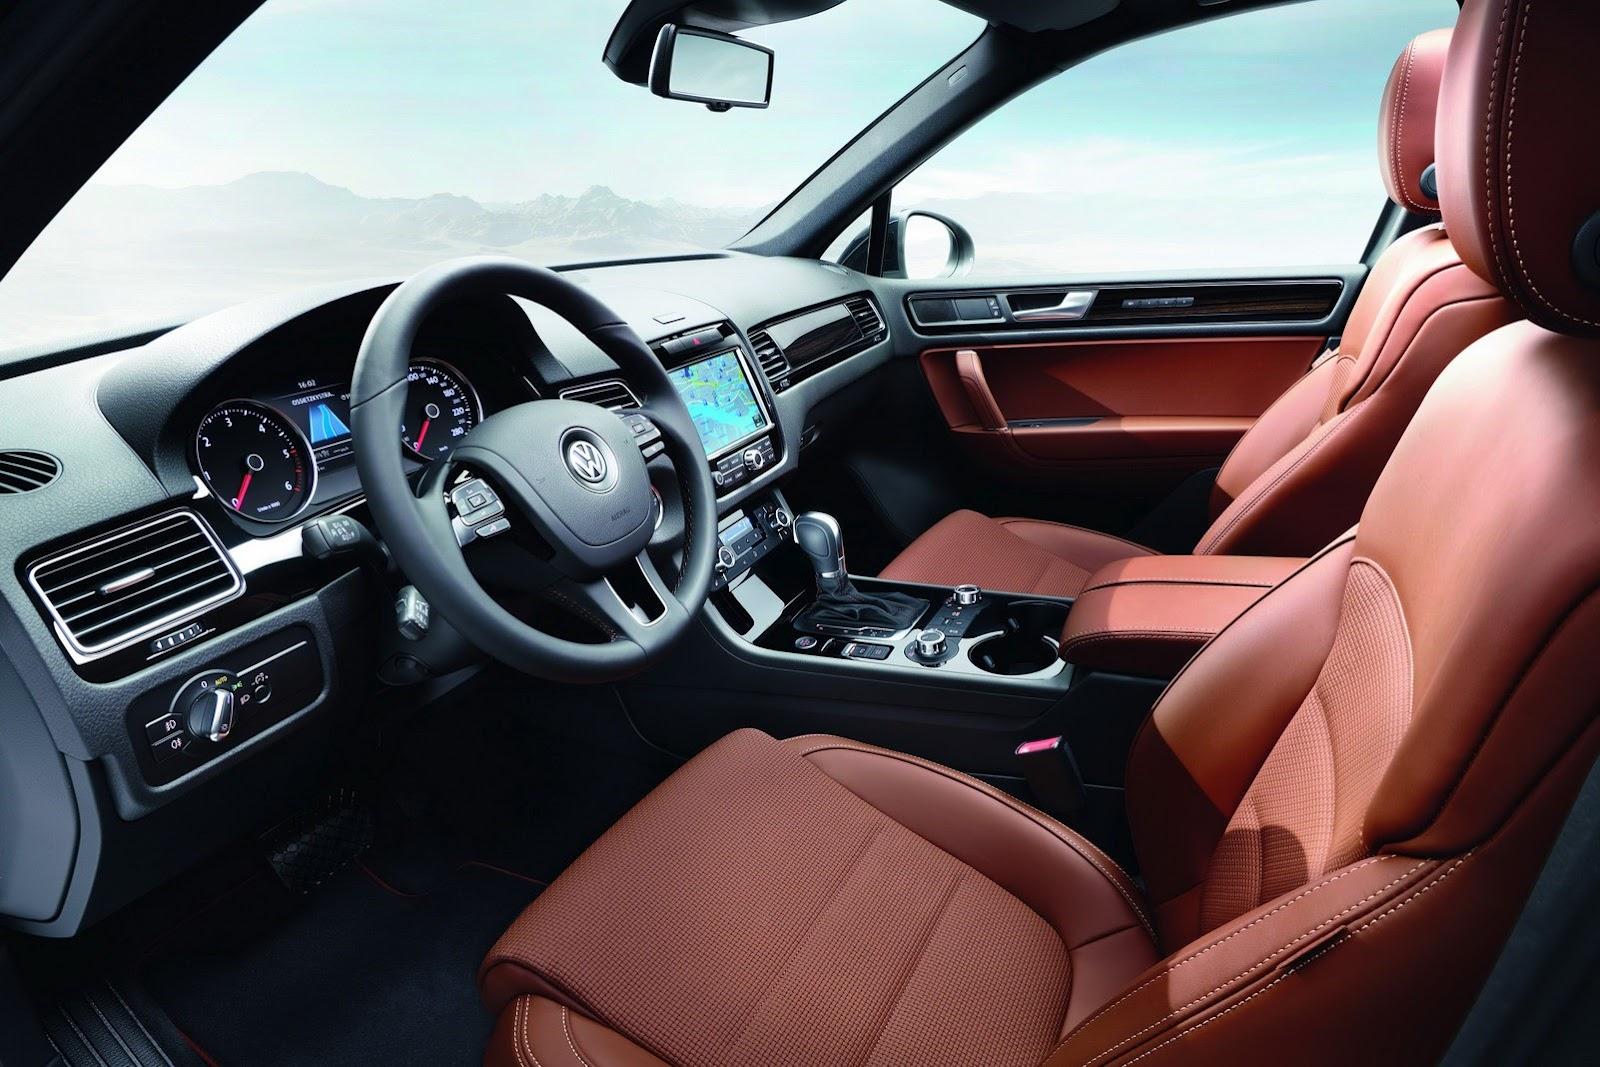 2013 Volkswagen Touareg Edition X Cars